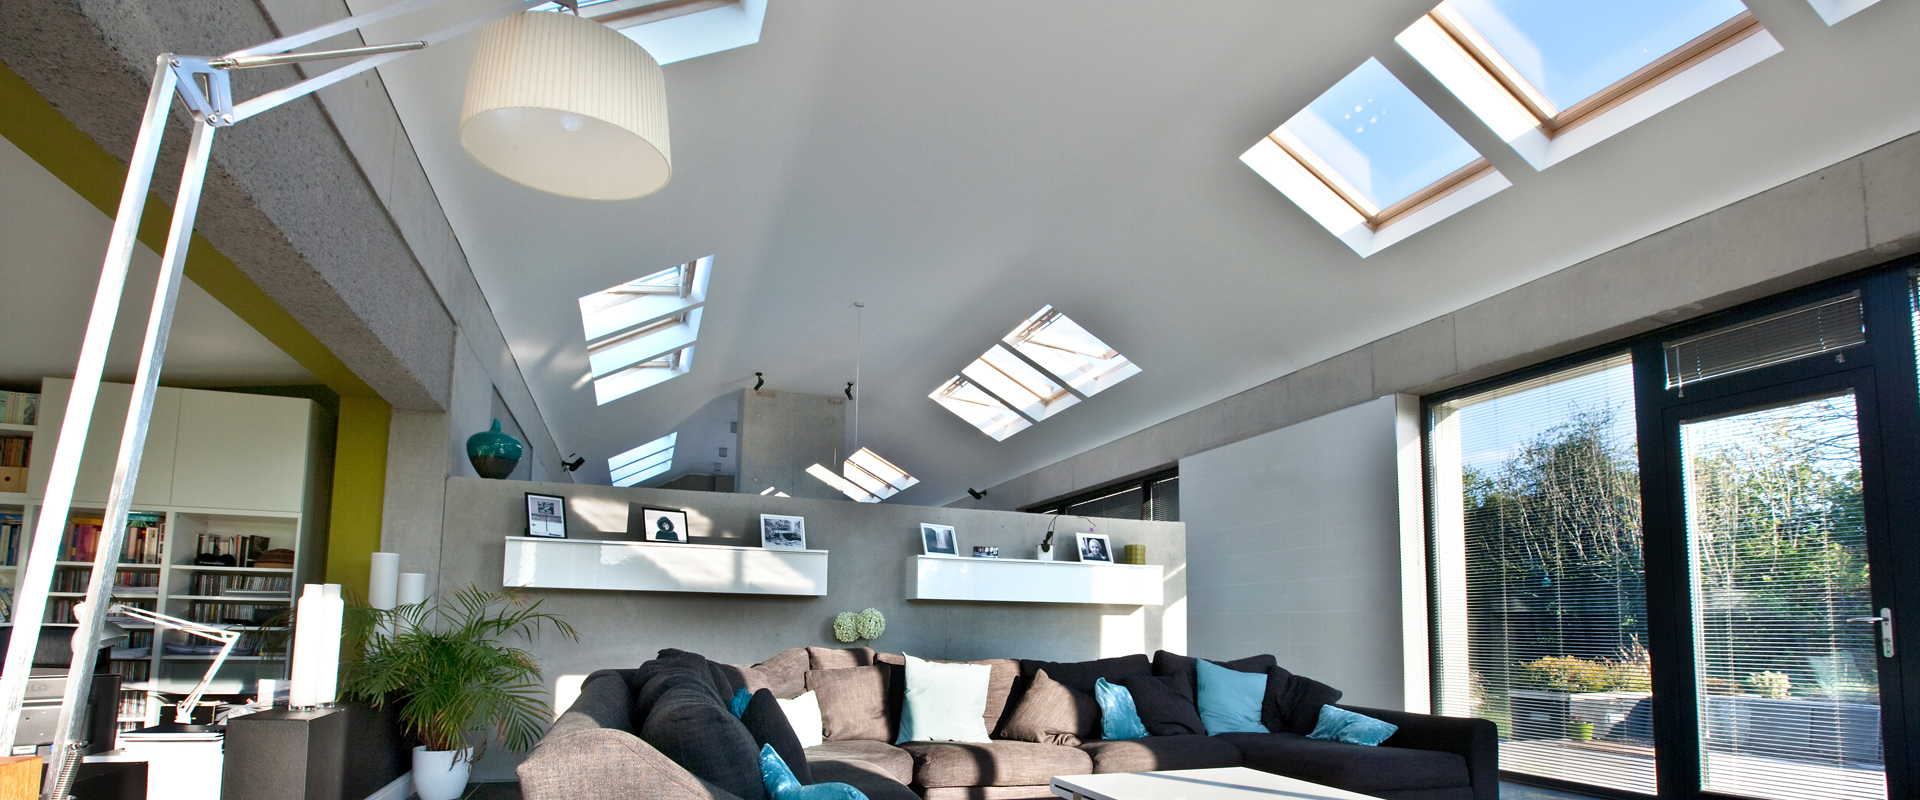 Bradley mcclure architects ltd for Architect ltd